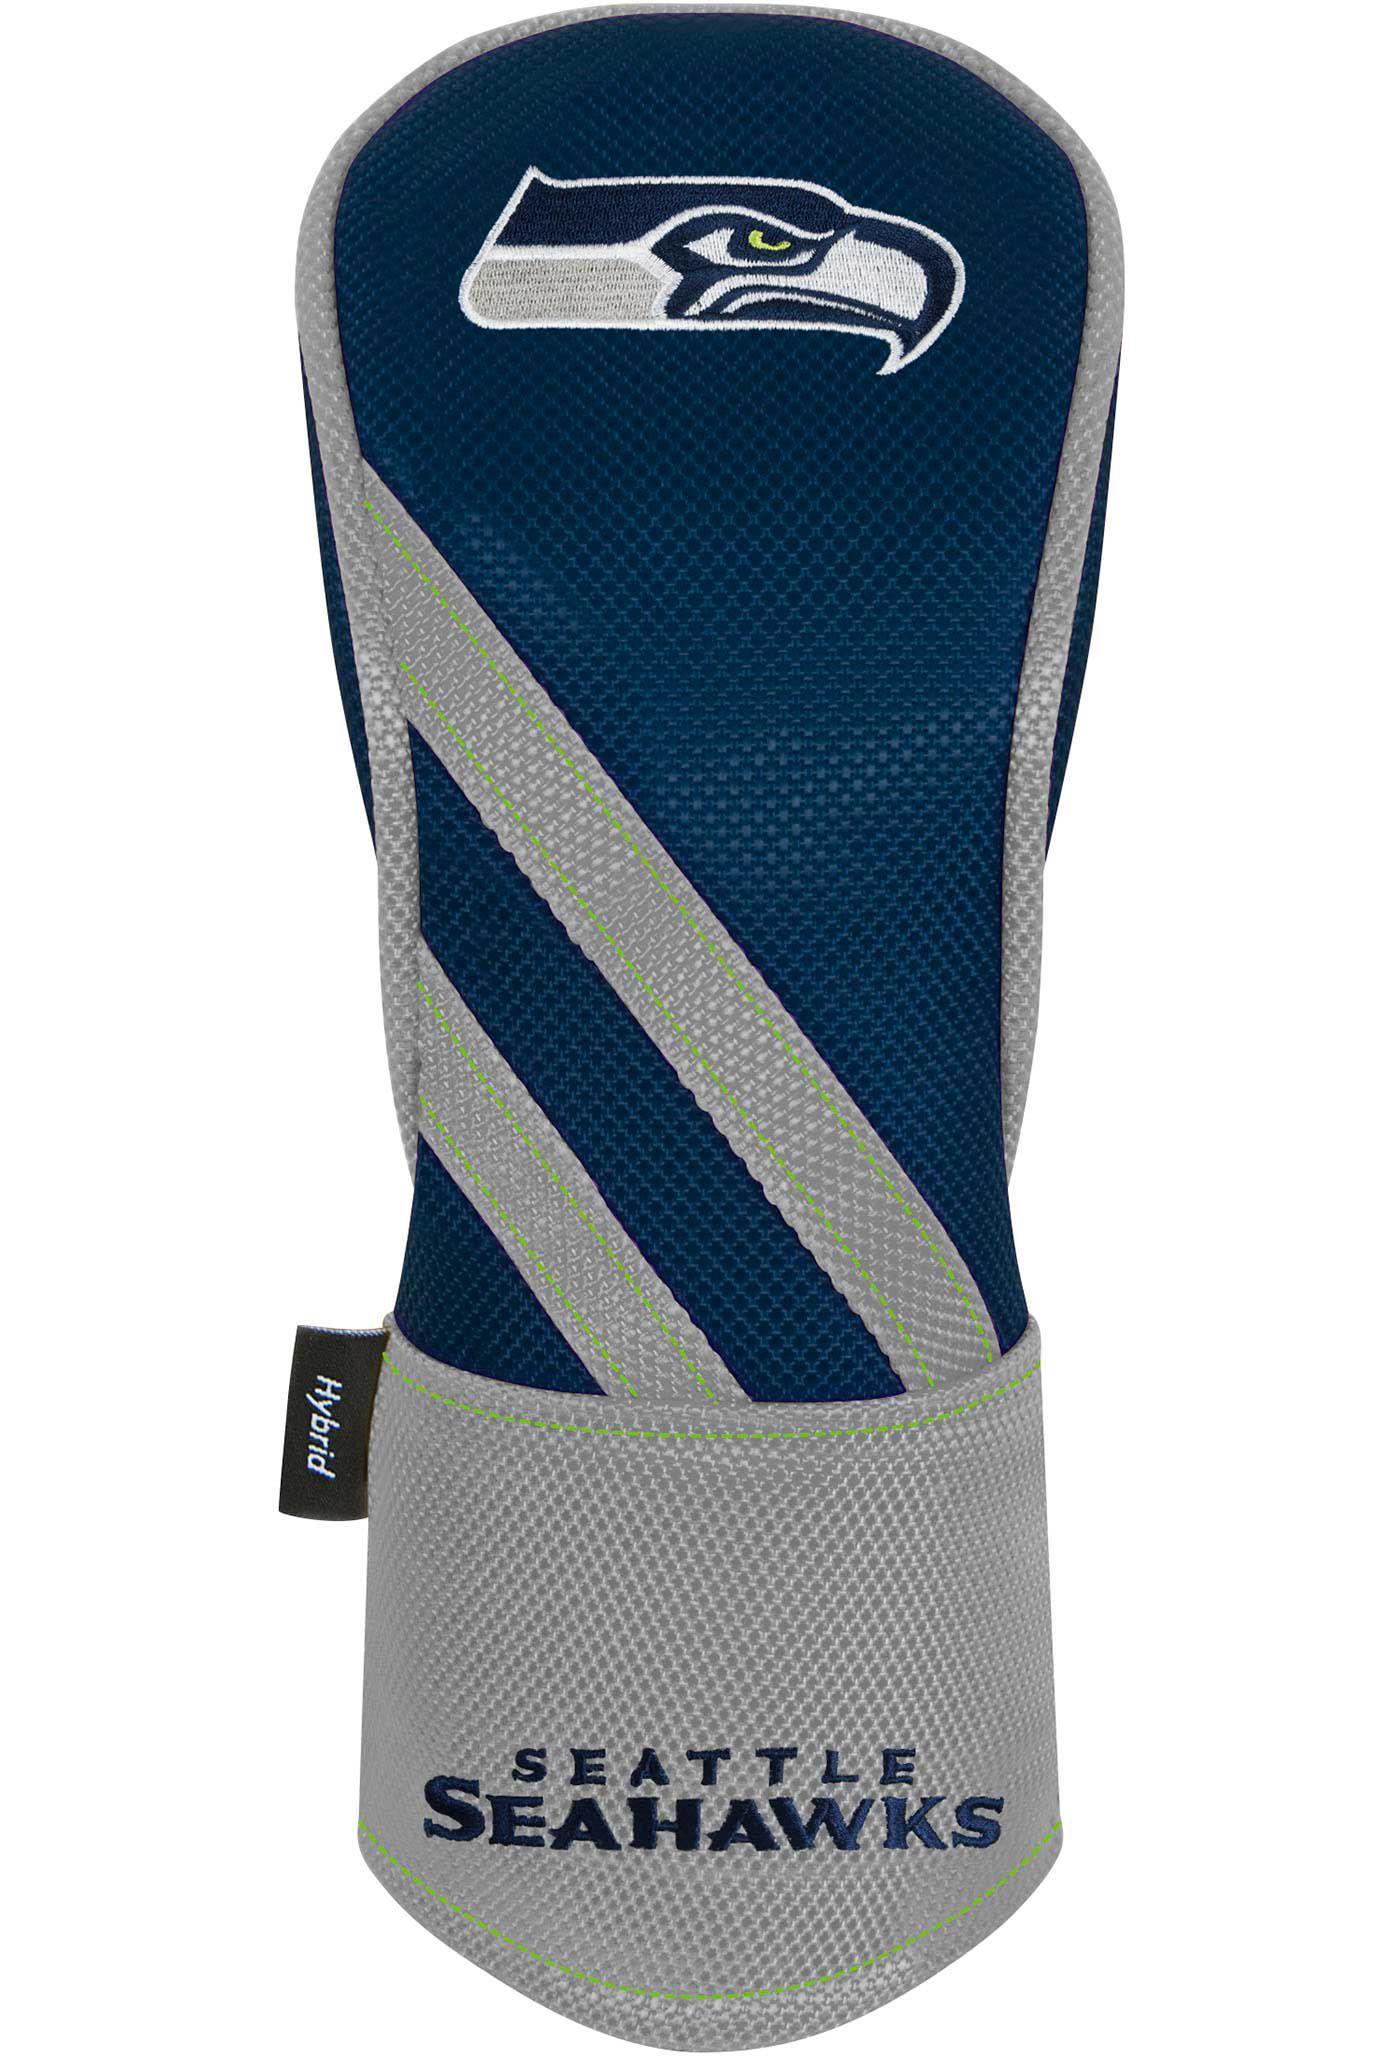 Team Effort Seattle Seahawks Hybrid Headcover